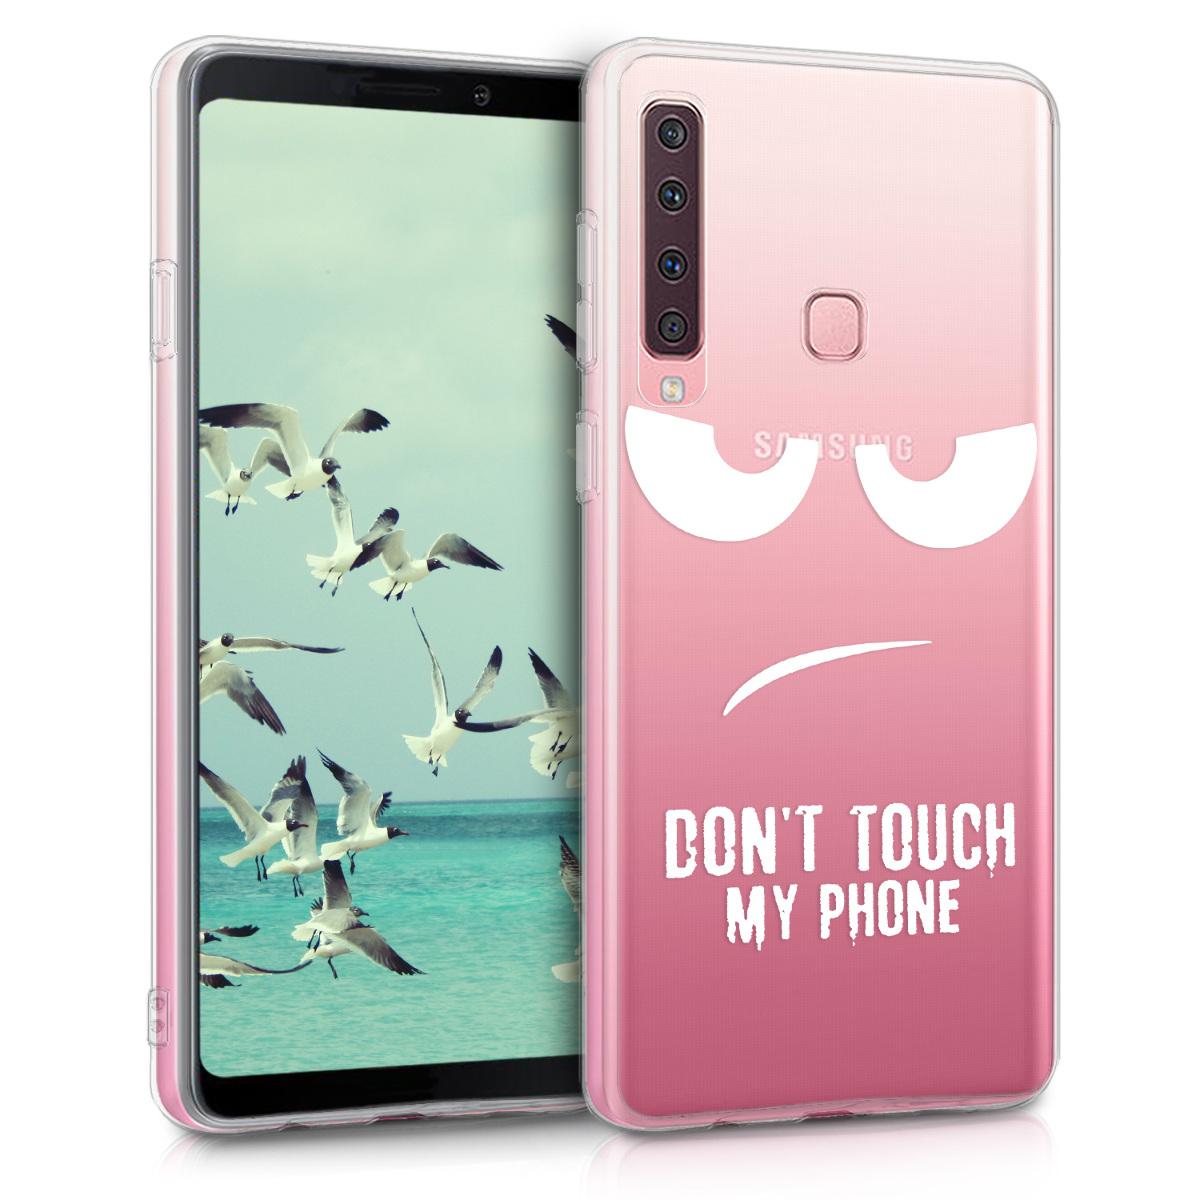 KW Θήκη Σιλικόνης TPU Samsung Galaxy A9 (2018) - Crystal Clear  - White / Transparent (46580.04)